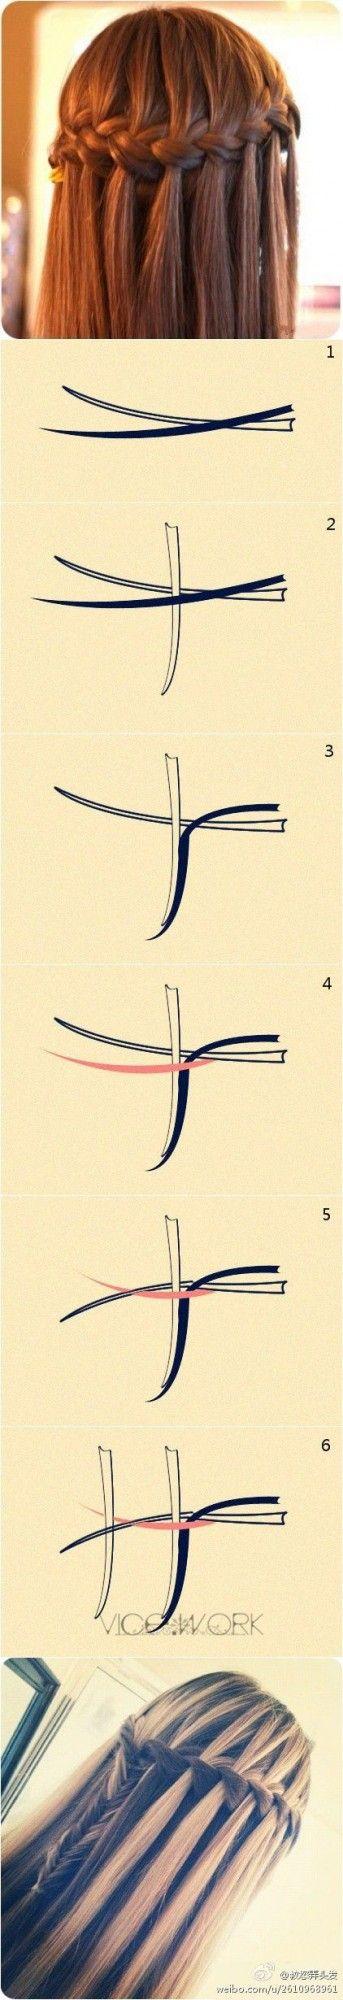 How to create a waterfall Braid